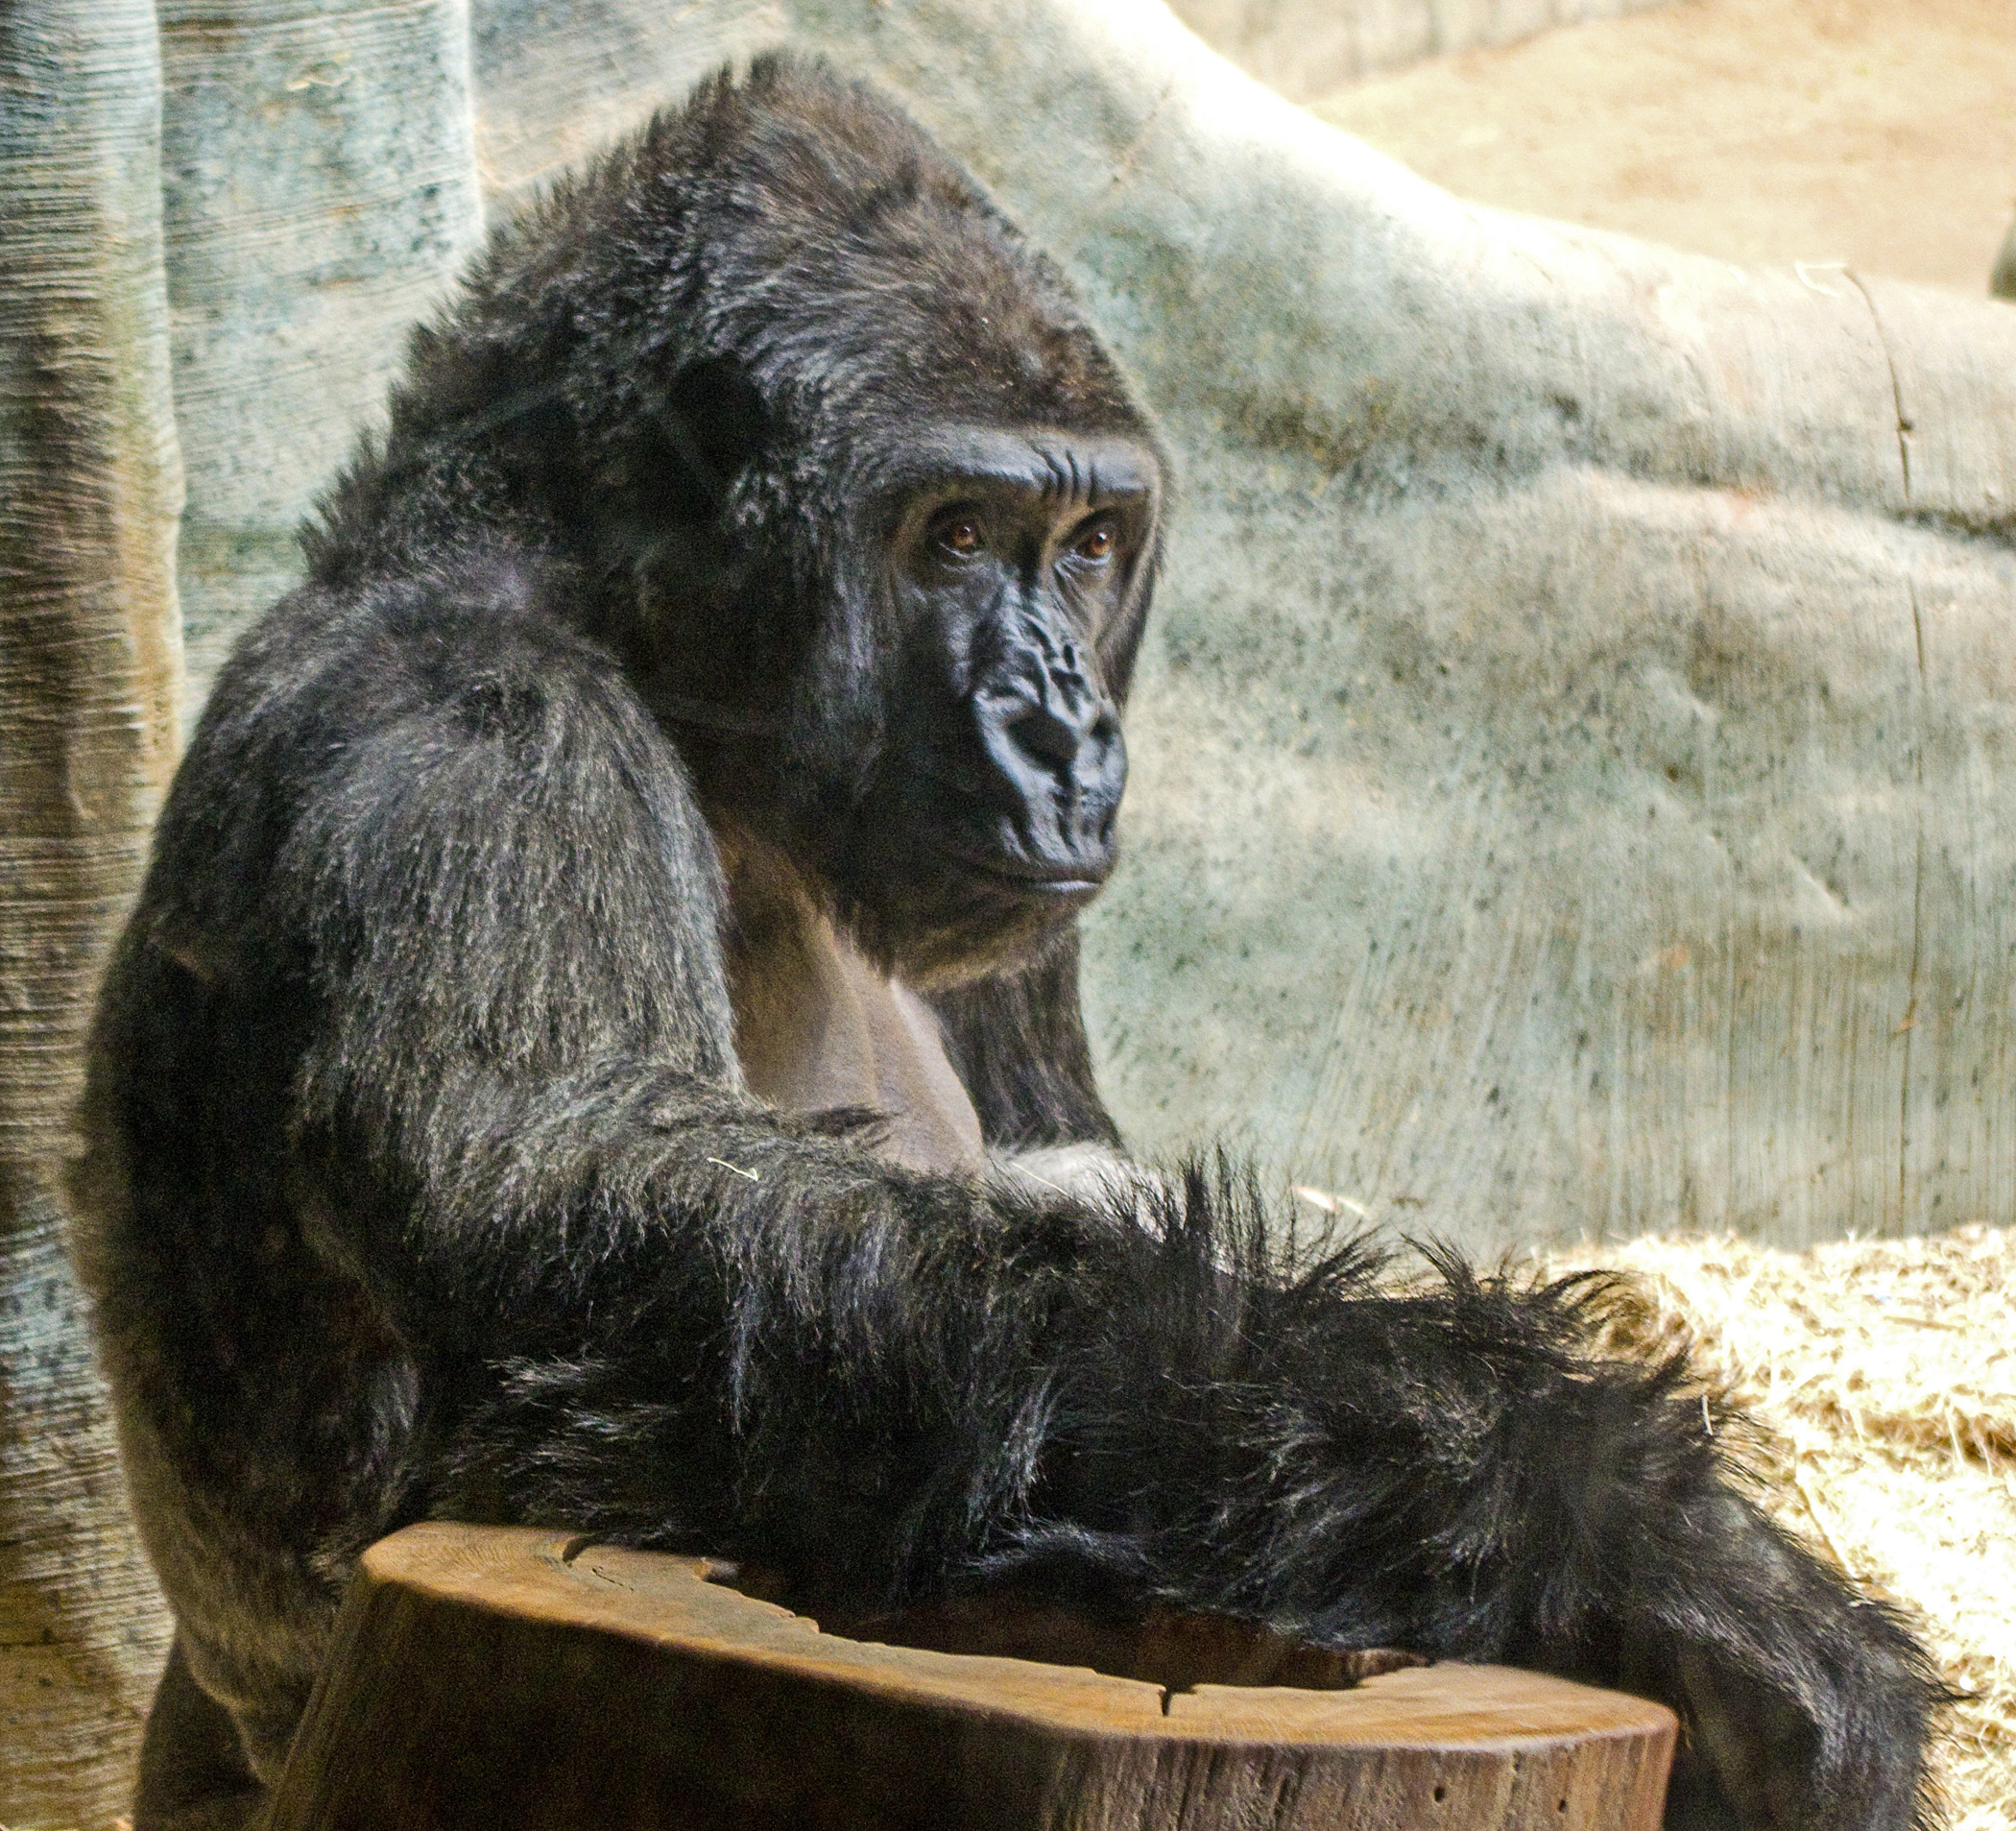 2013 MKE Zoo Gorilla at 2100.jpg